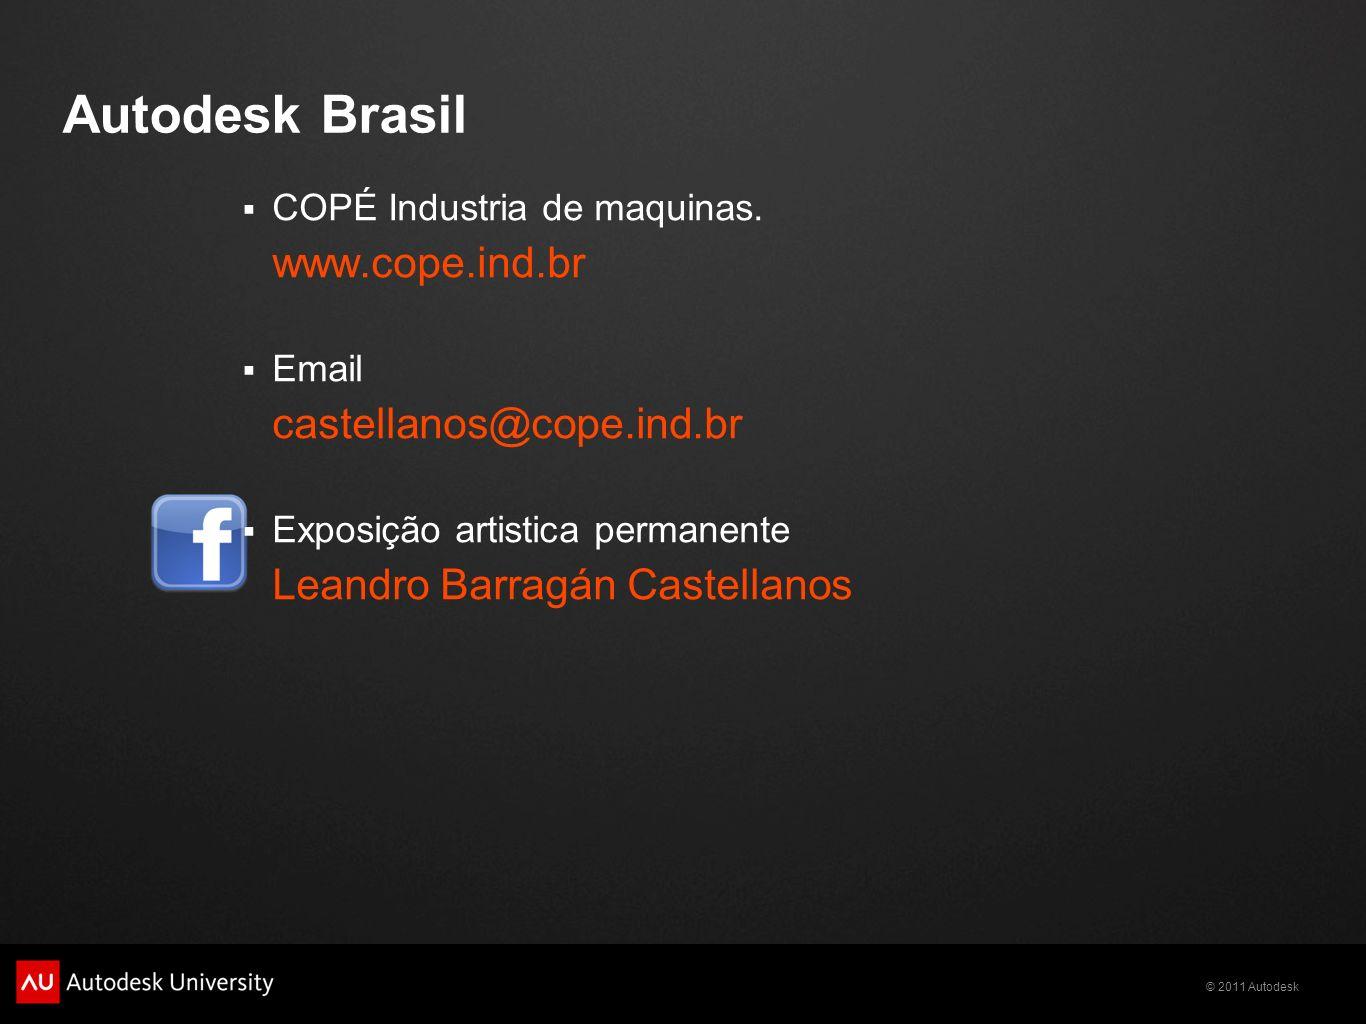 © 2011 Autodesk Autodesk Brasil COPÉ Industria de maquinas. www.cope.ind.br Email castellanos@cope.ind.br Exposição artistica permanente Leandro Barra